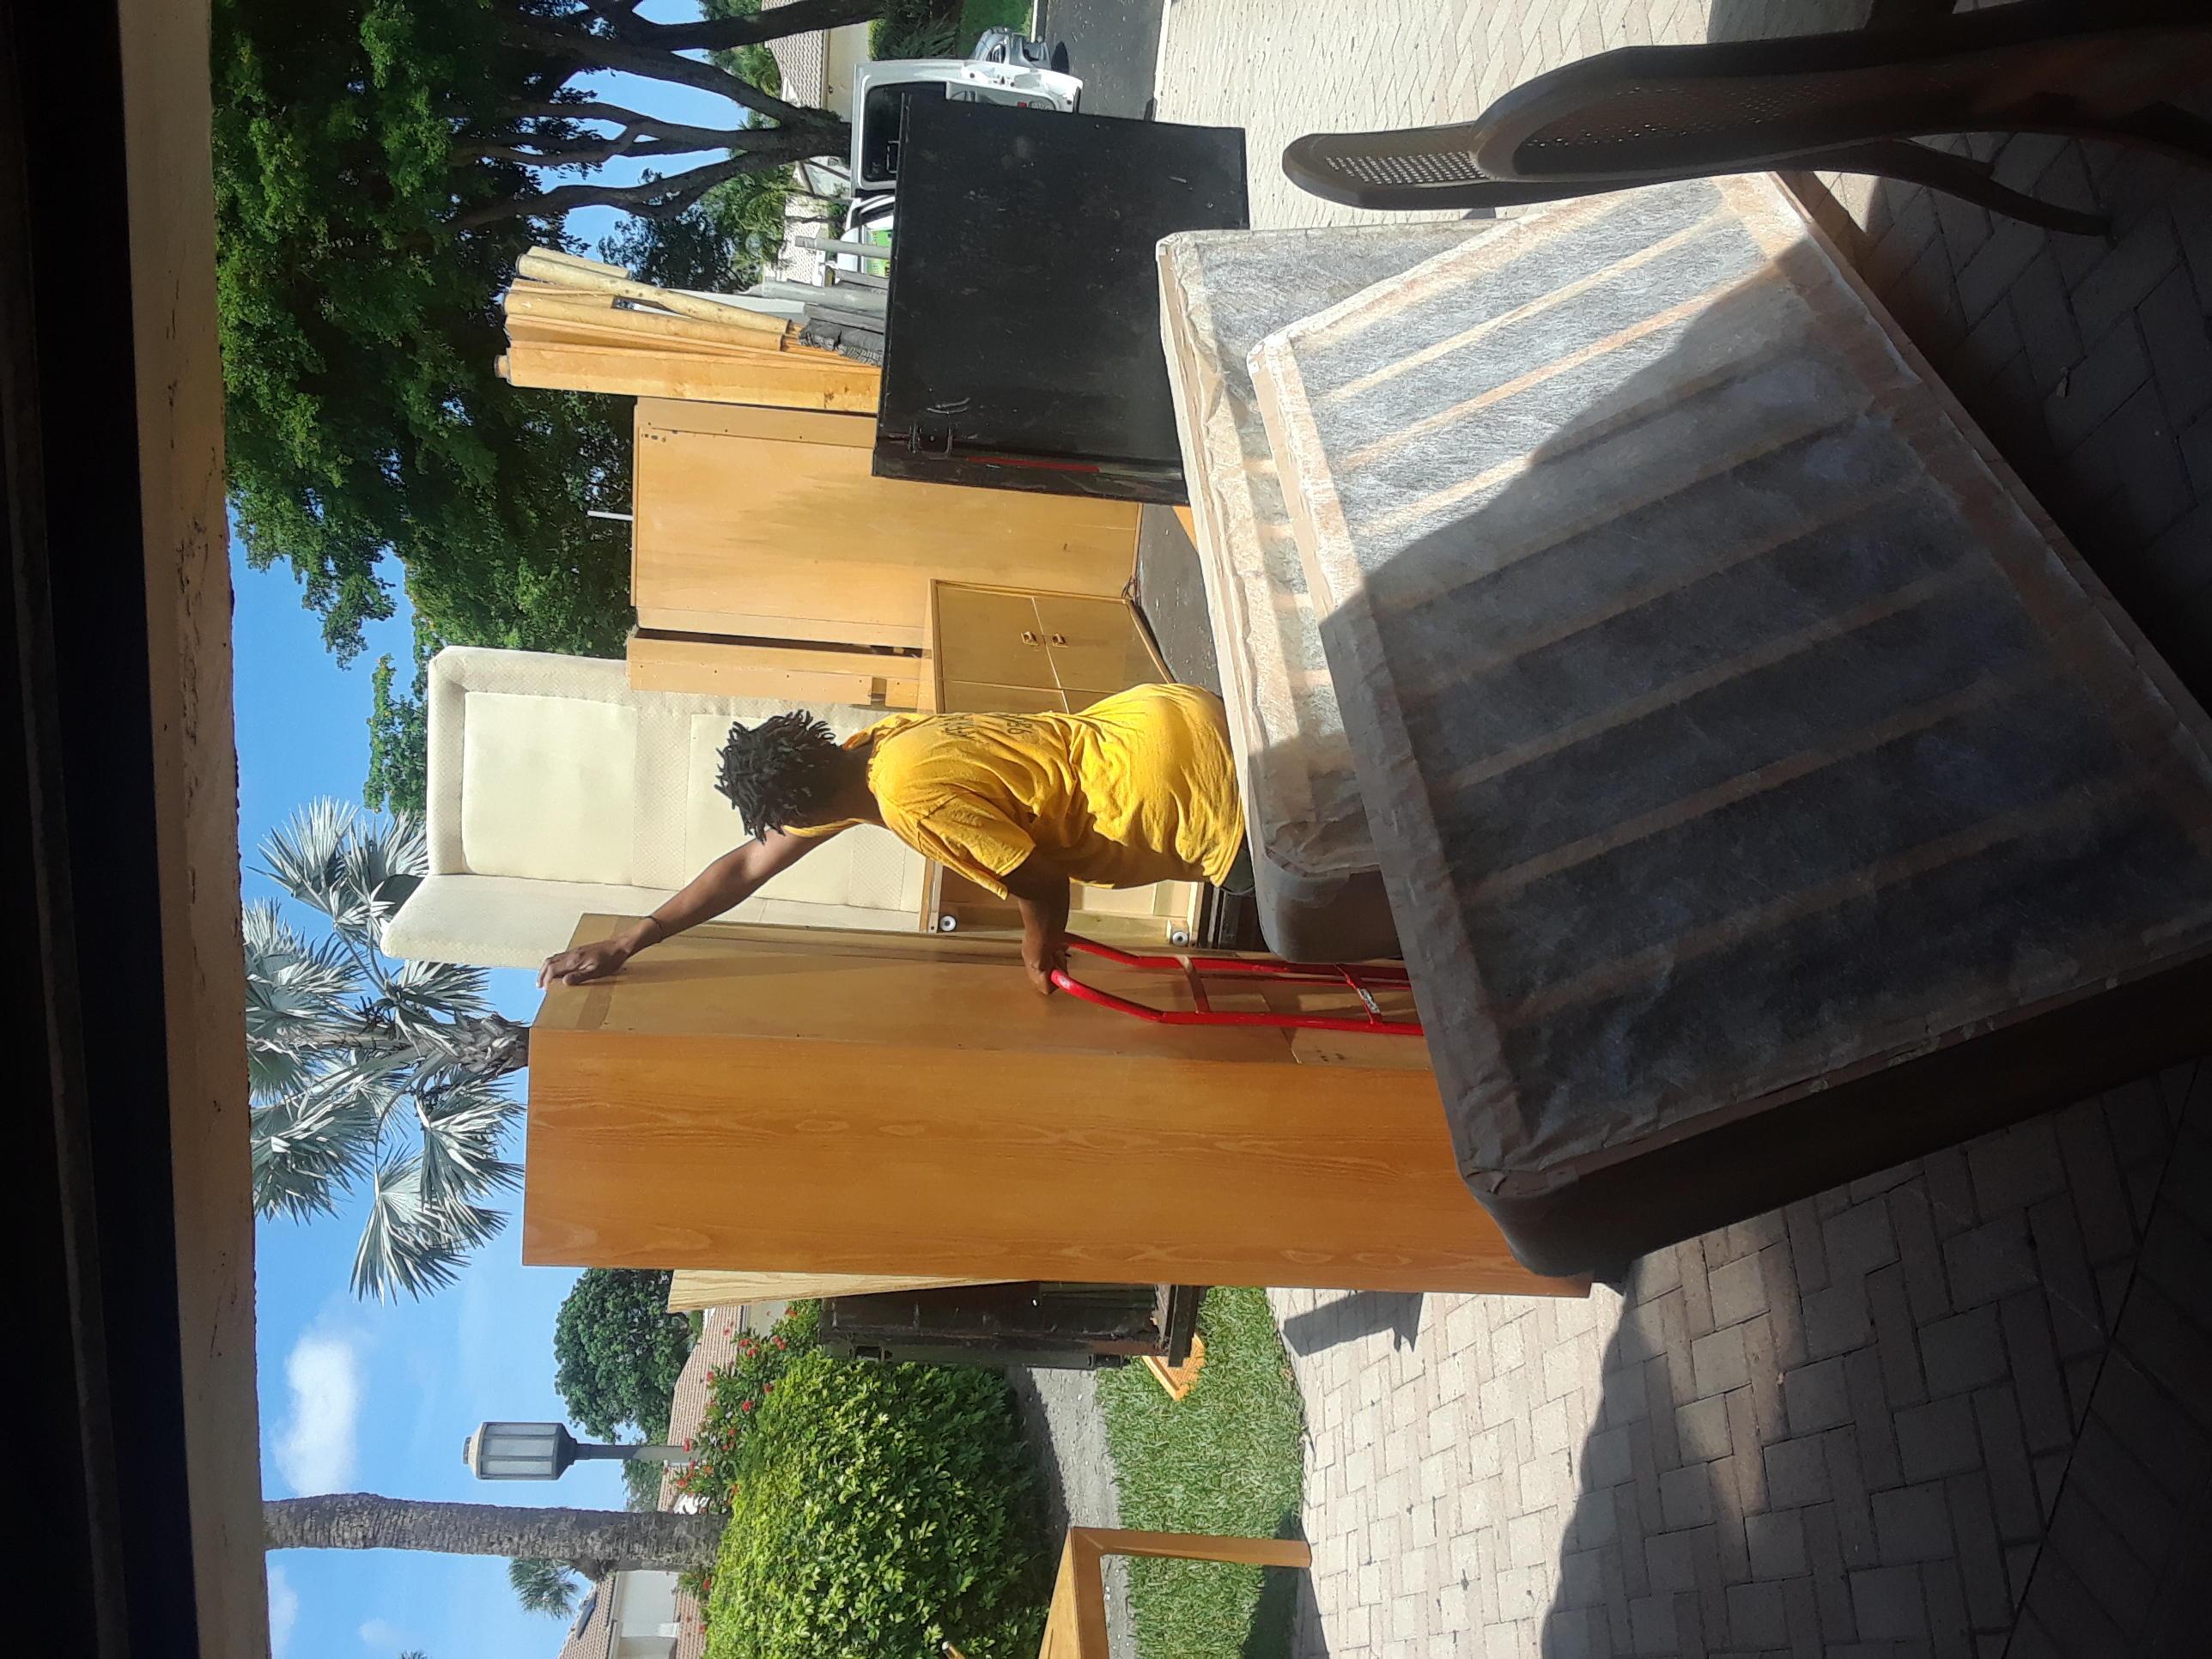 Affordable Trash Removal LLC - Fort Lauderdale, FL 33319 - (954)329-0659 | ShowMeLocal.com